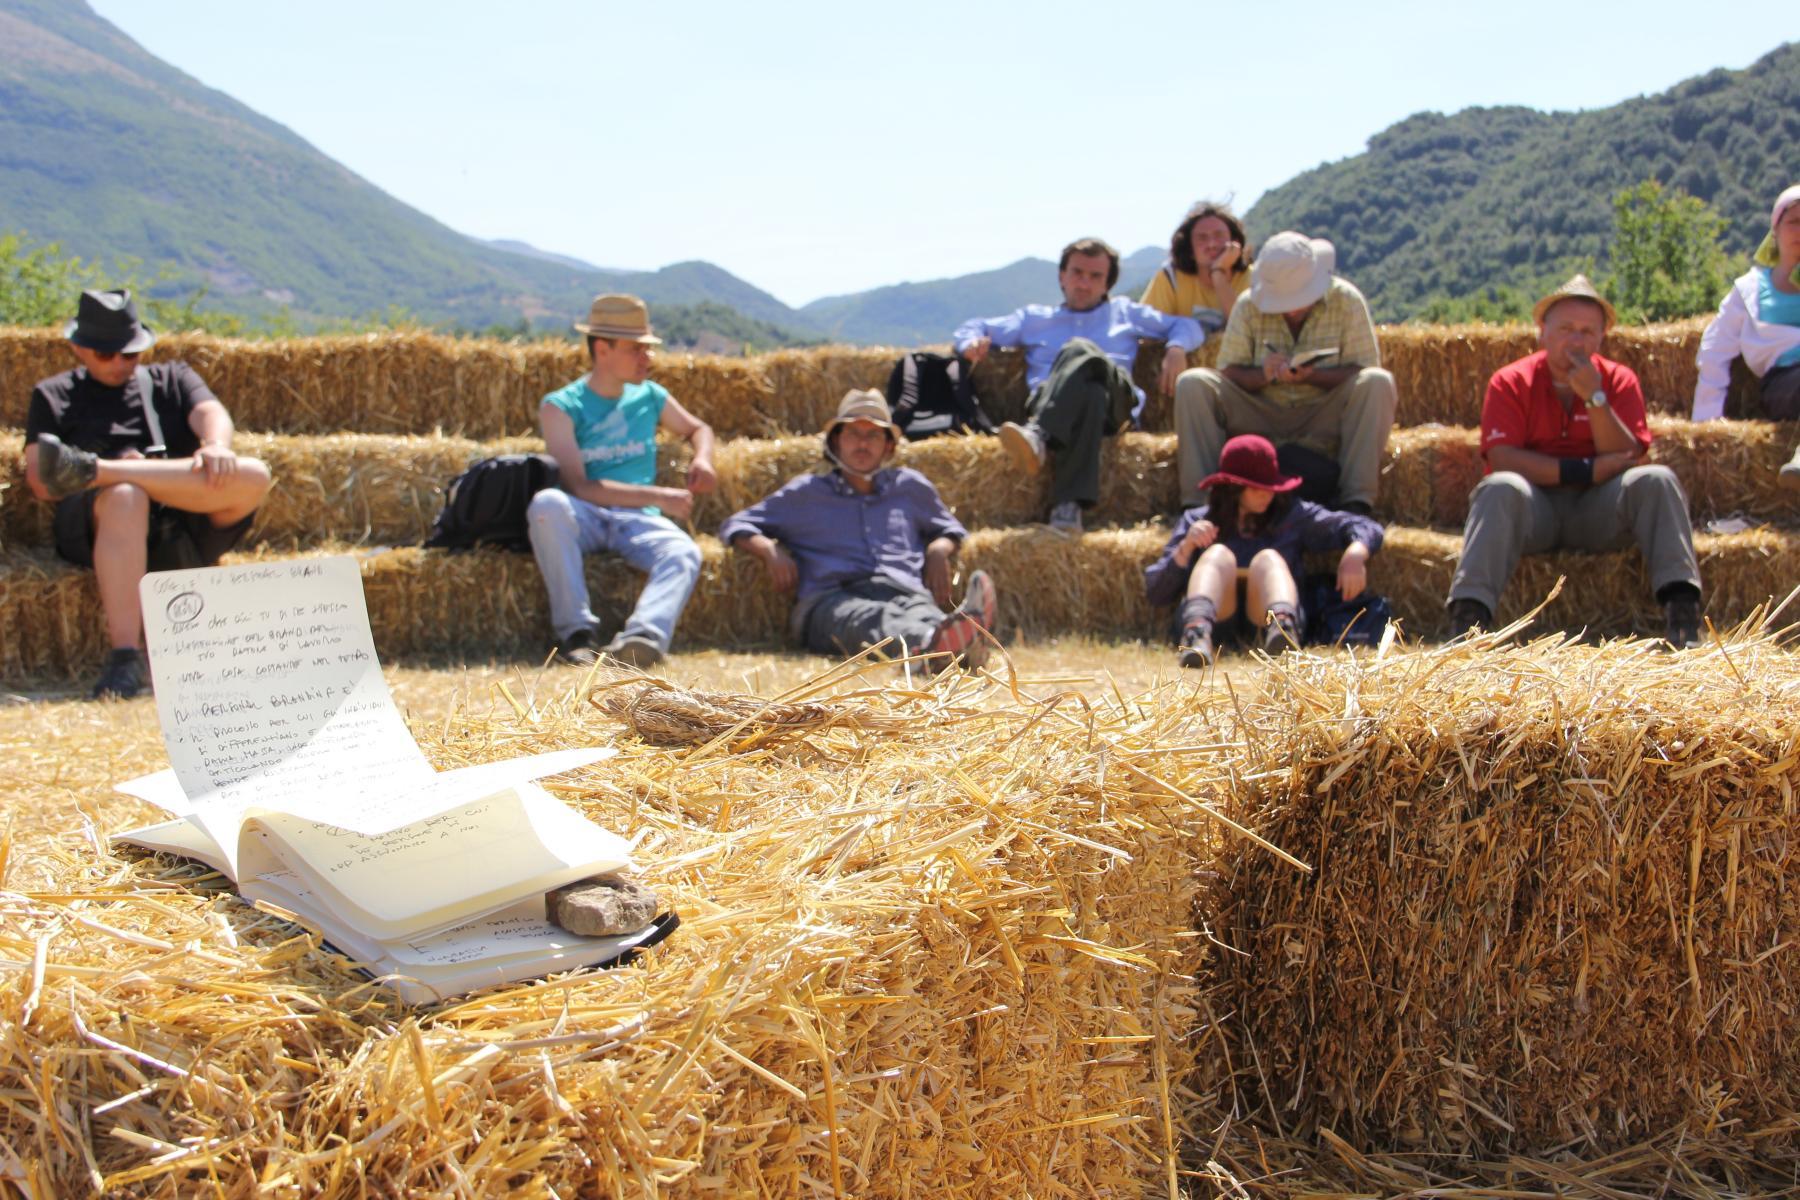 Comunità in aree rurali